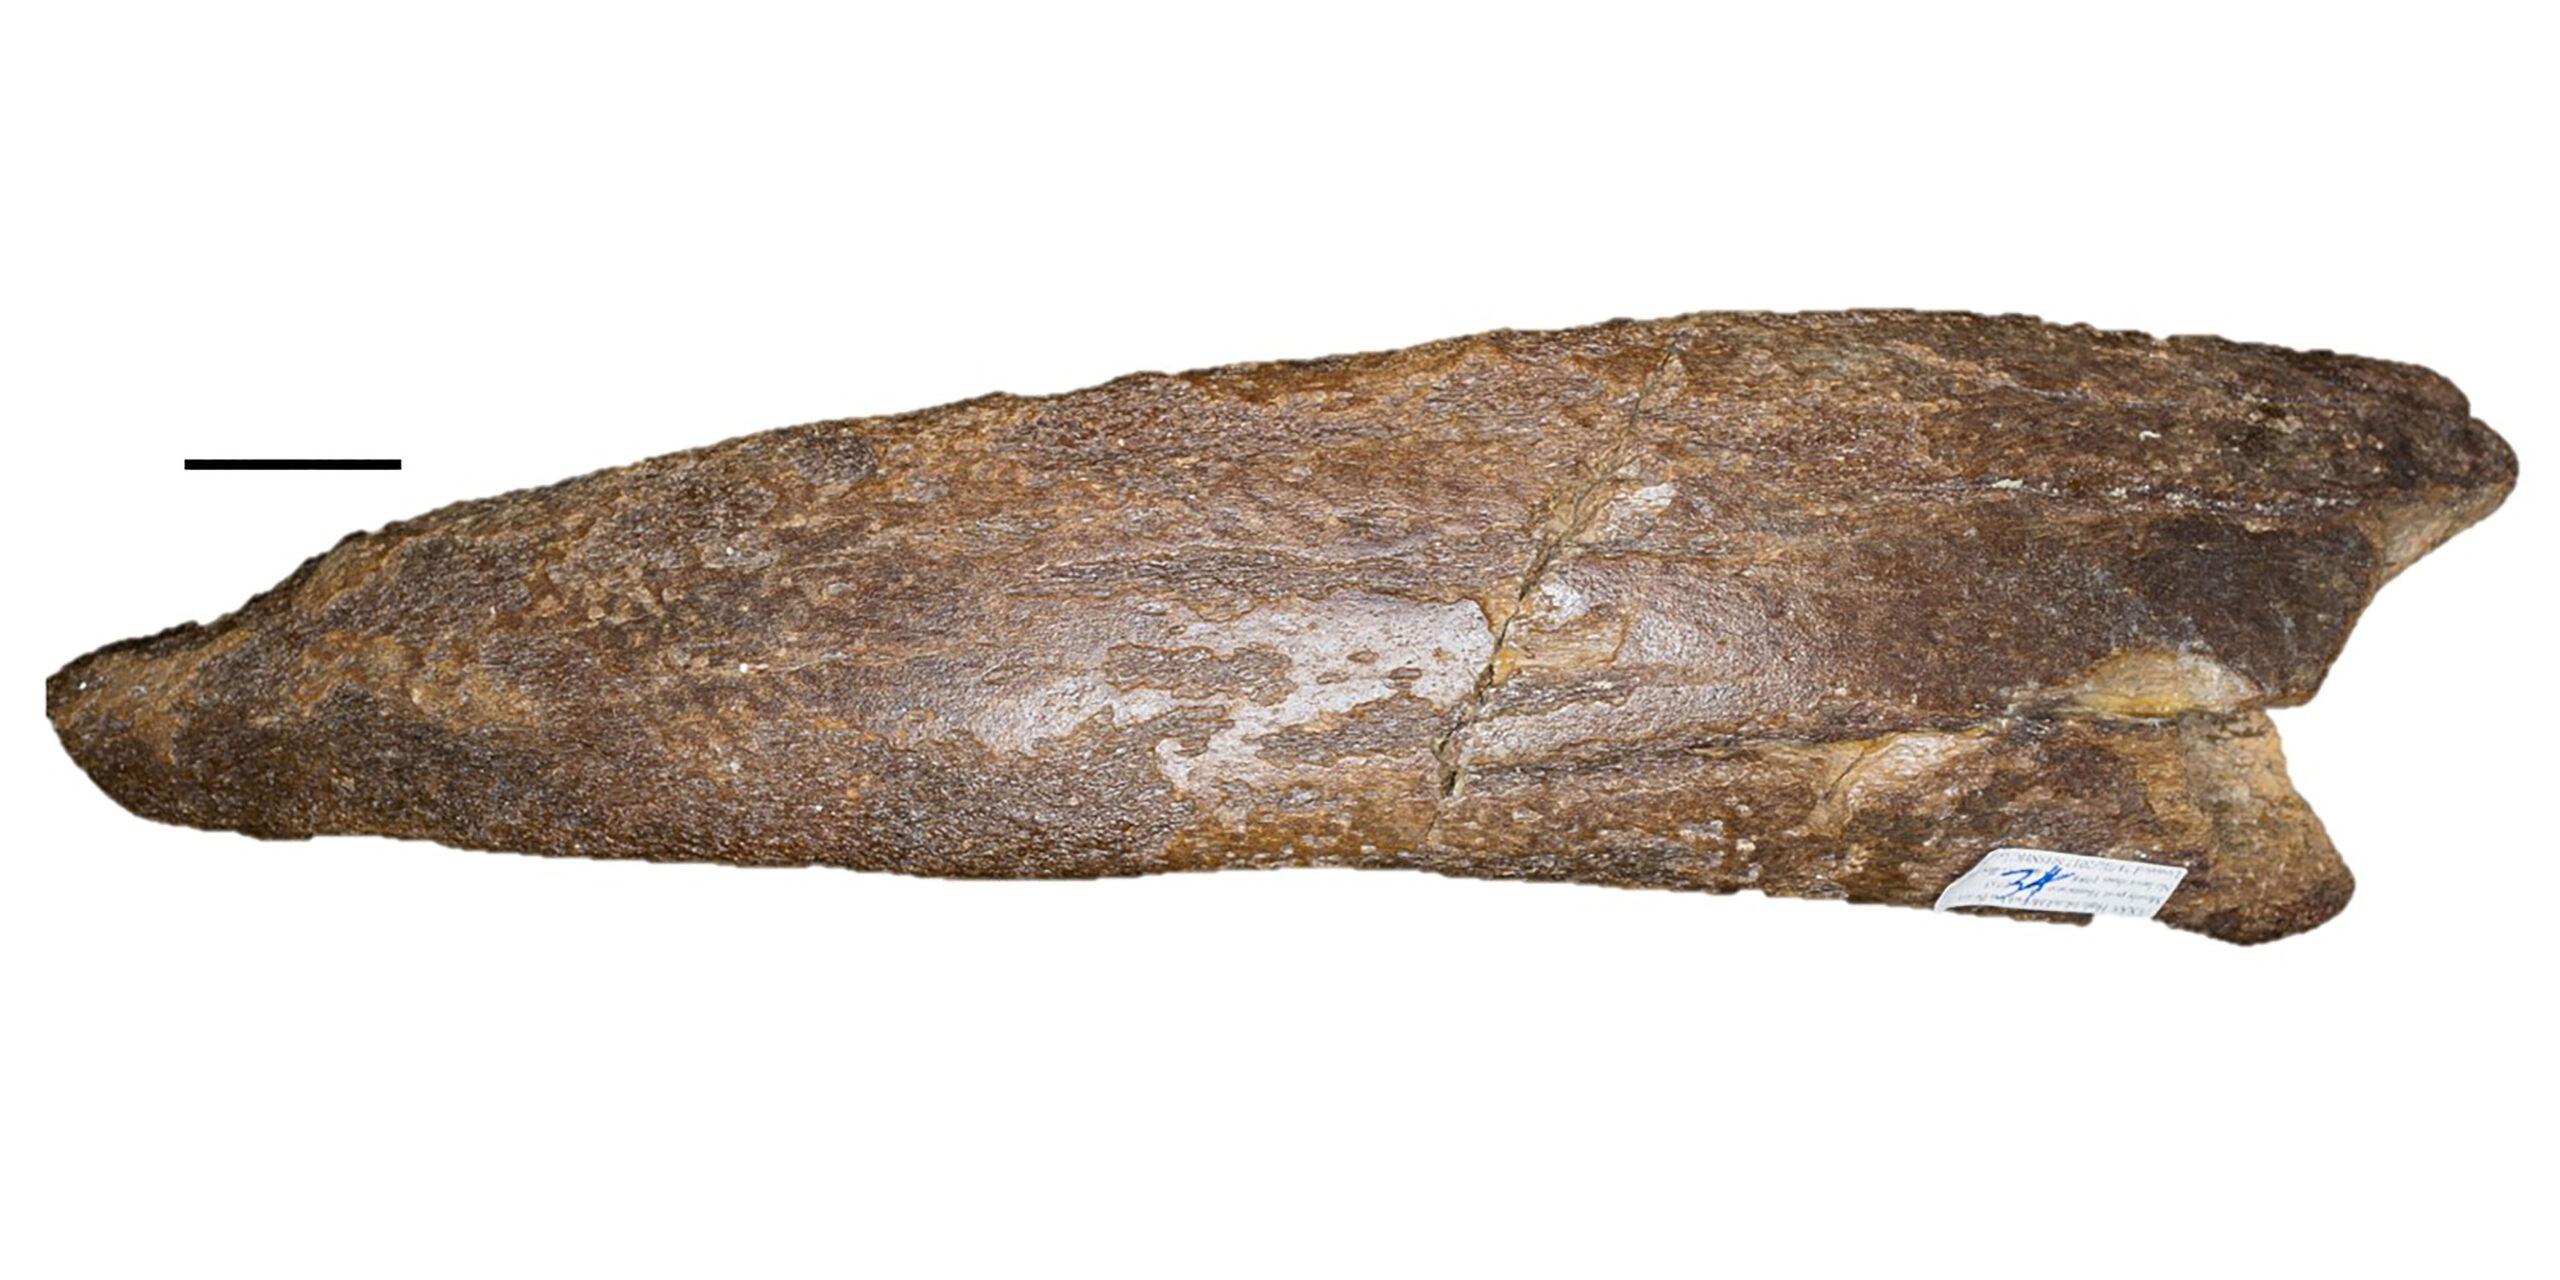 A manatee rib fragment fossil